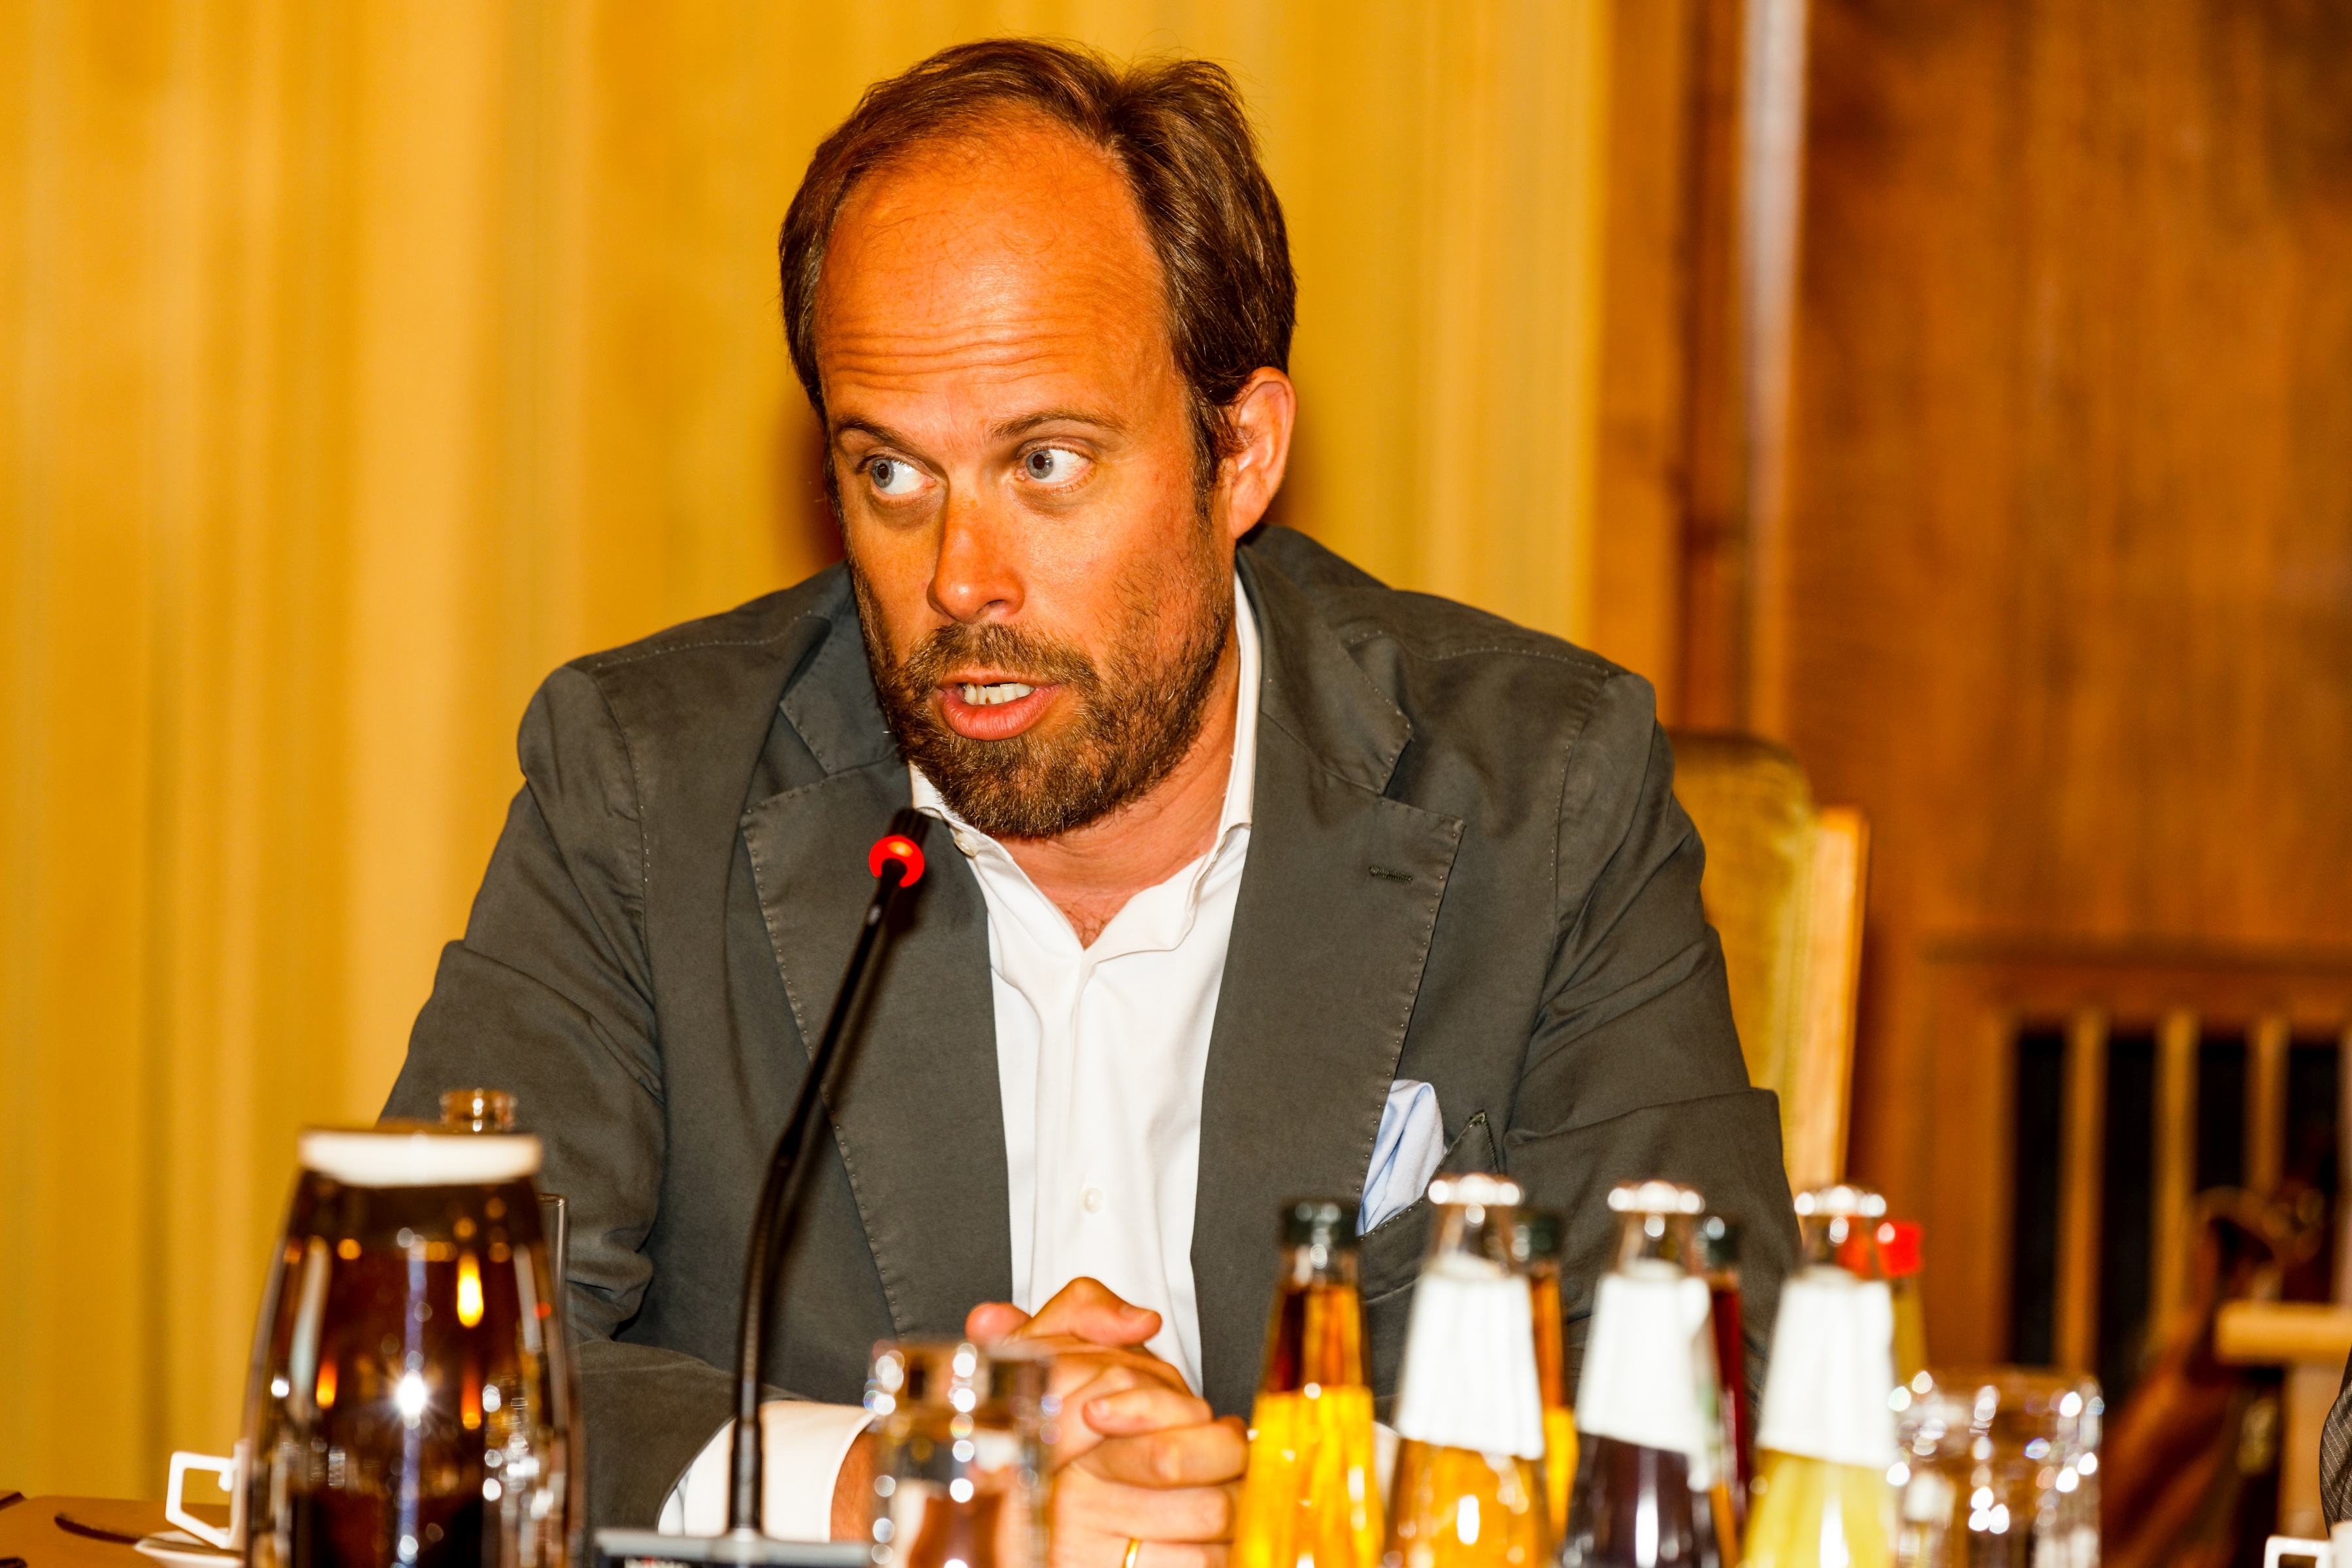 Pressekonferenz German Bowl 25.6.2019